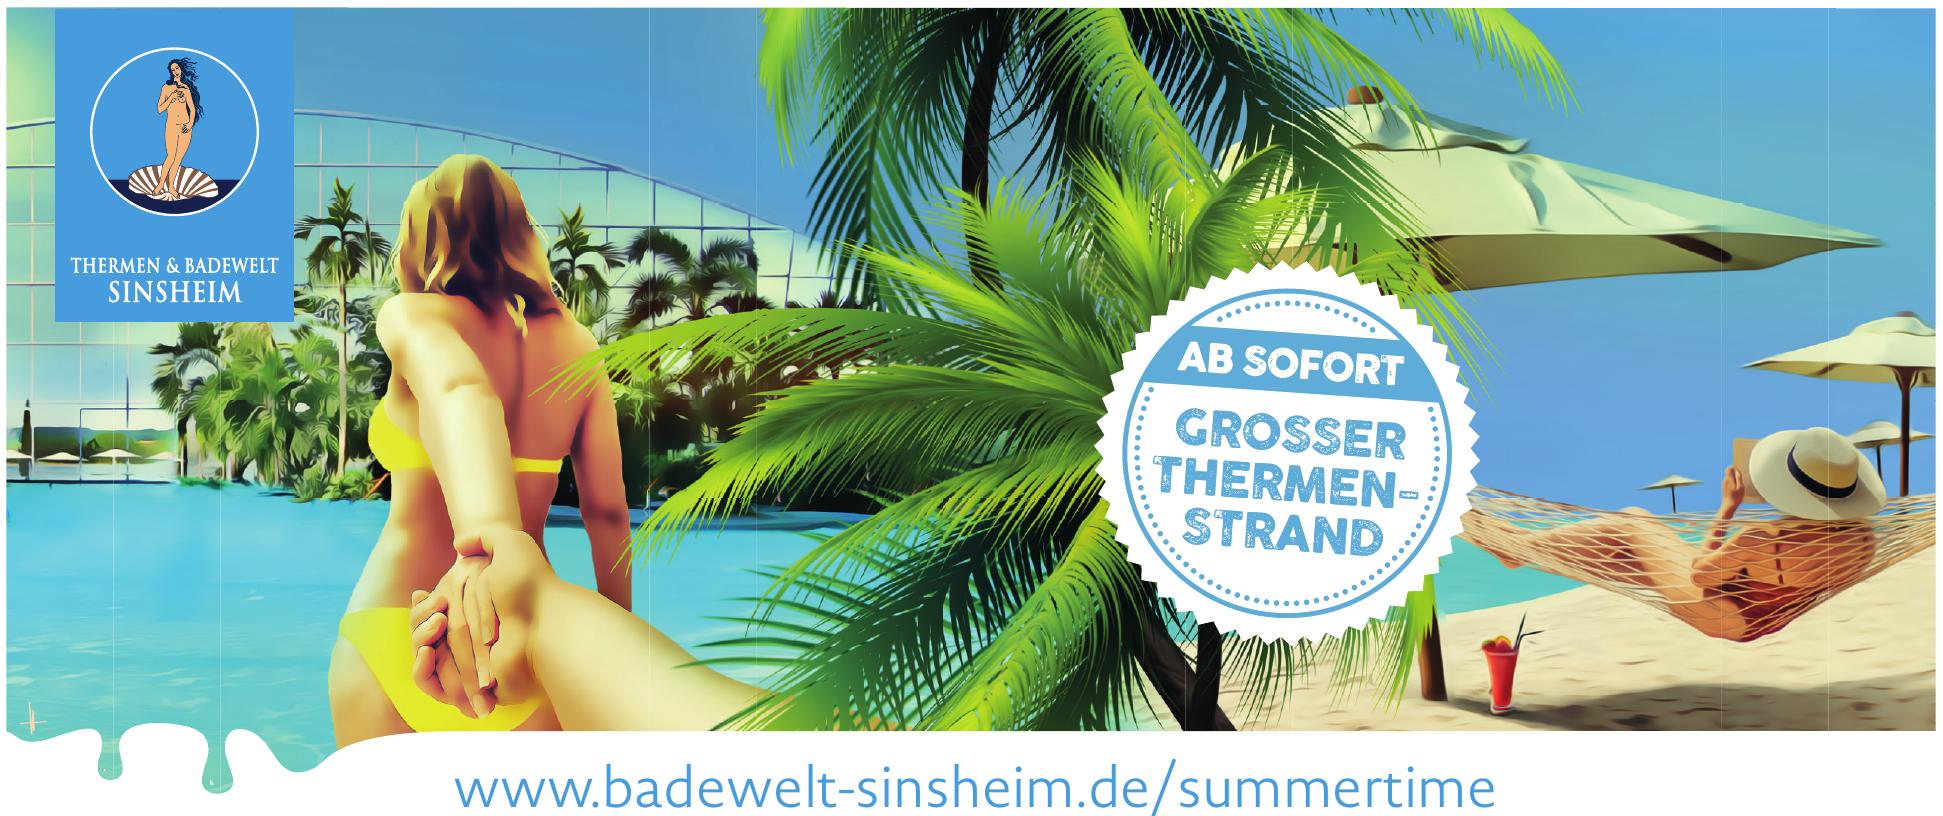 Badewelt Sinsheim GmbH